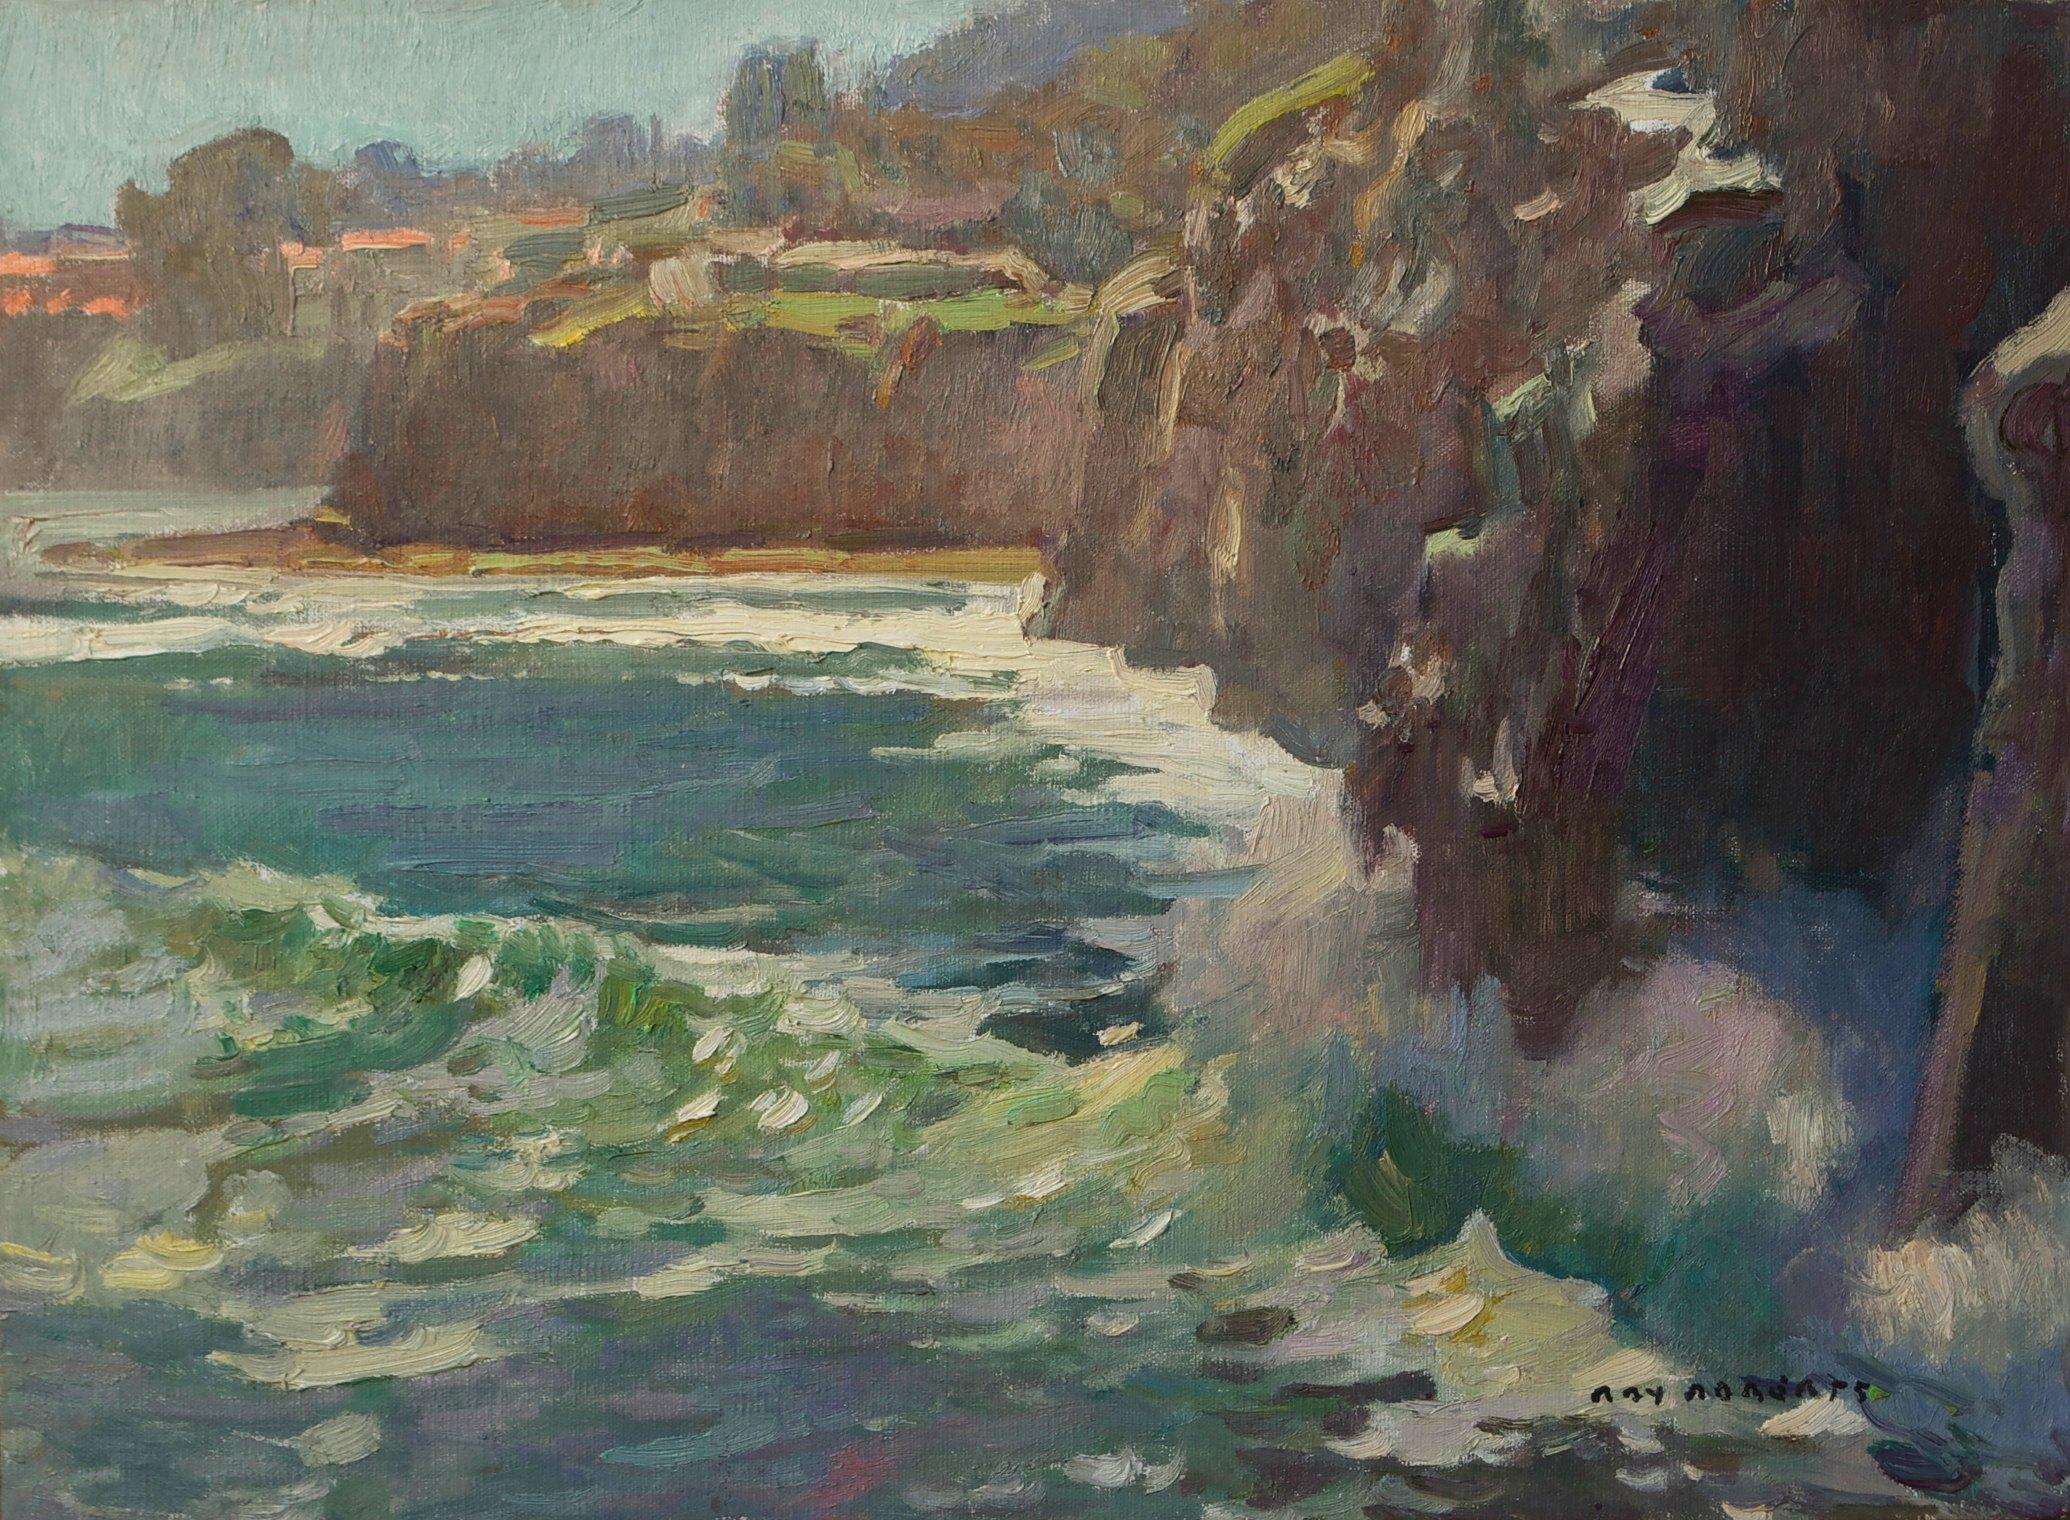 Laguna Invitational Artist Ray Roberts